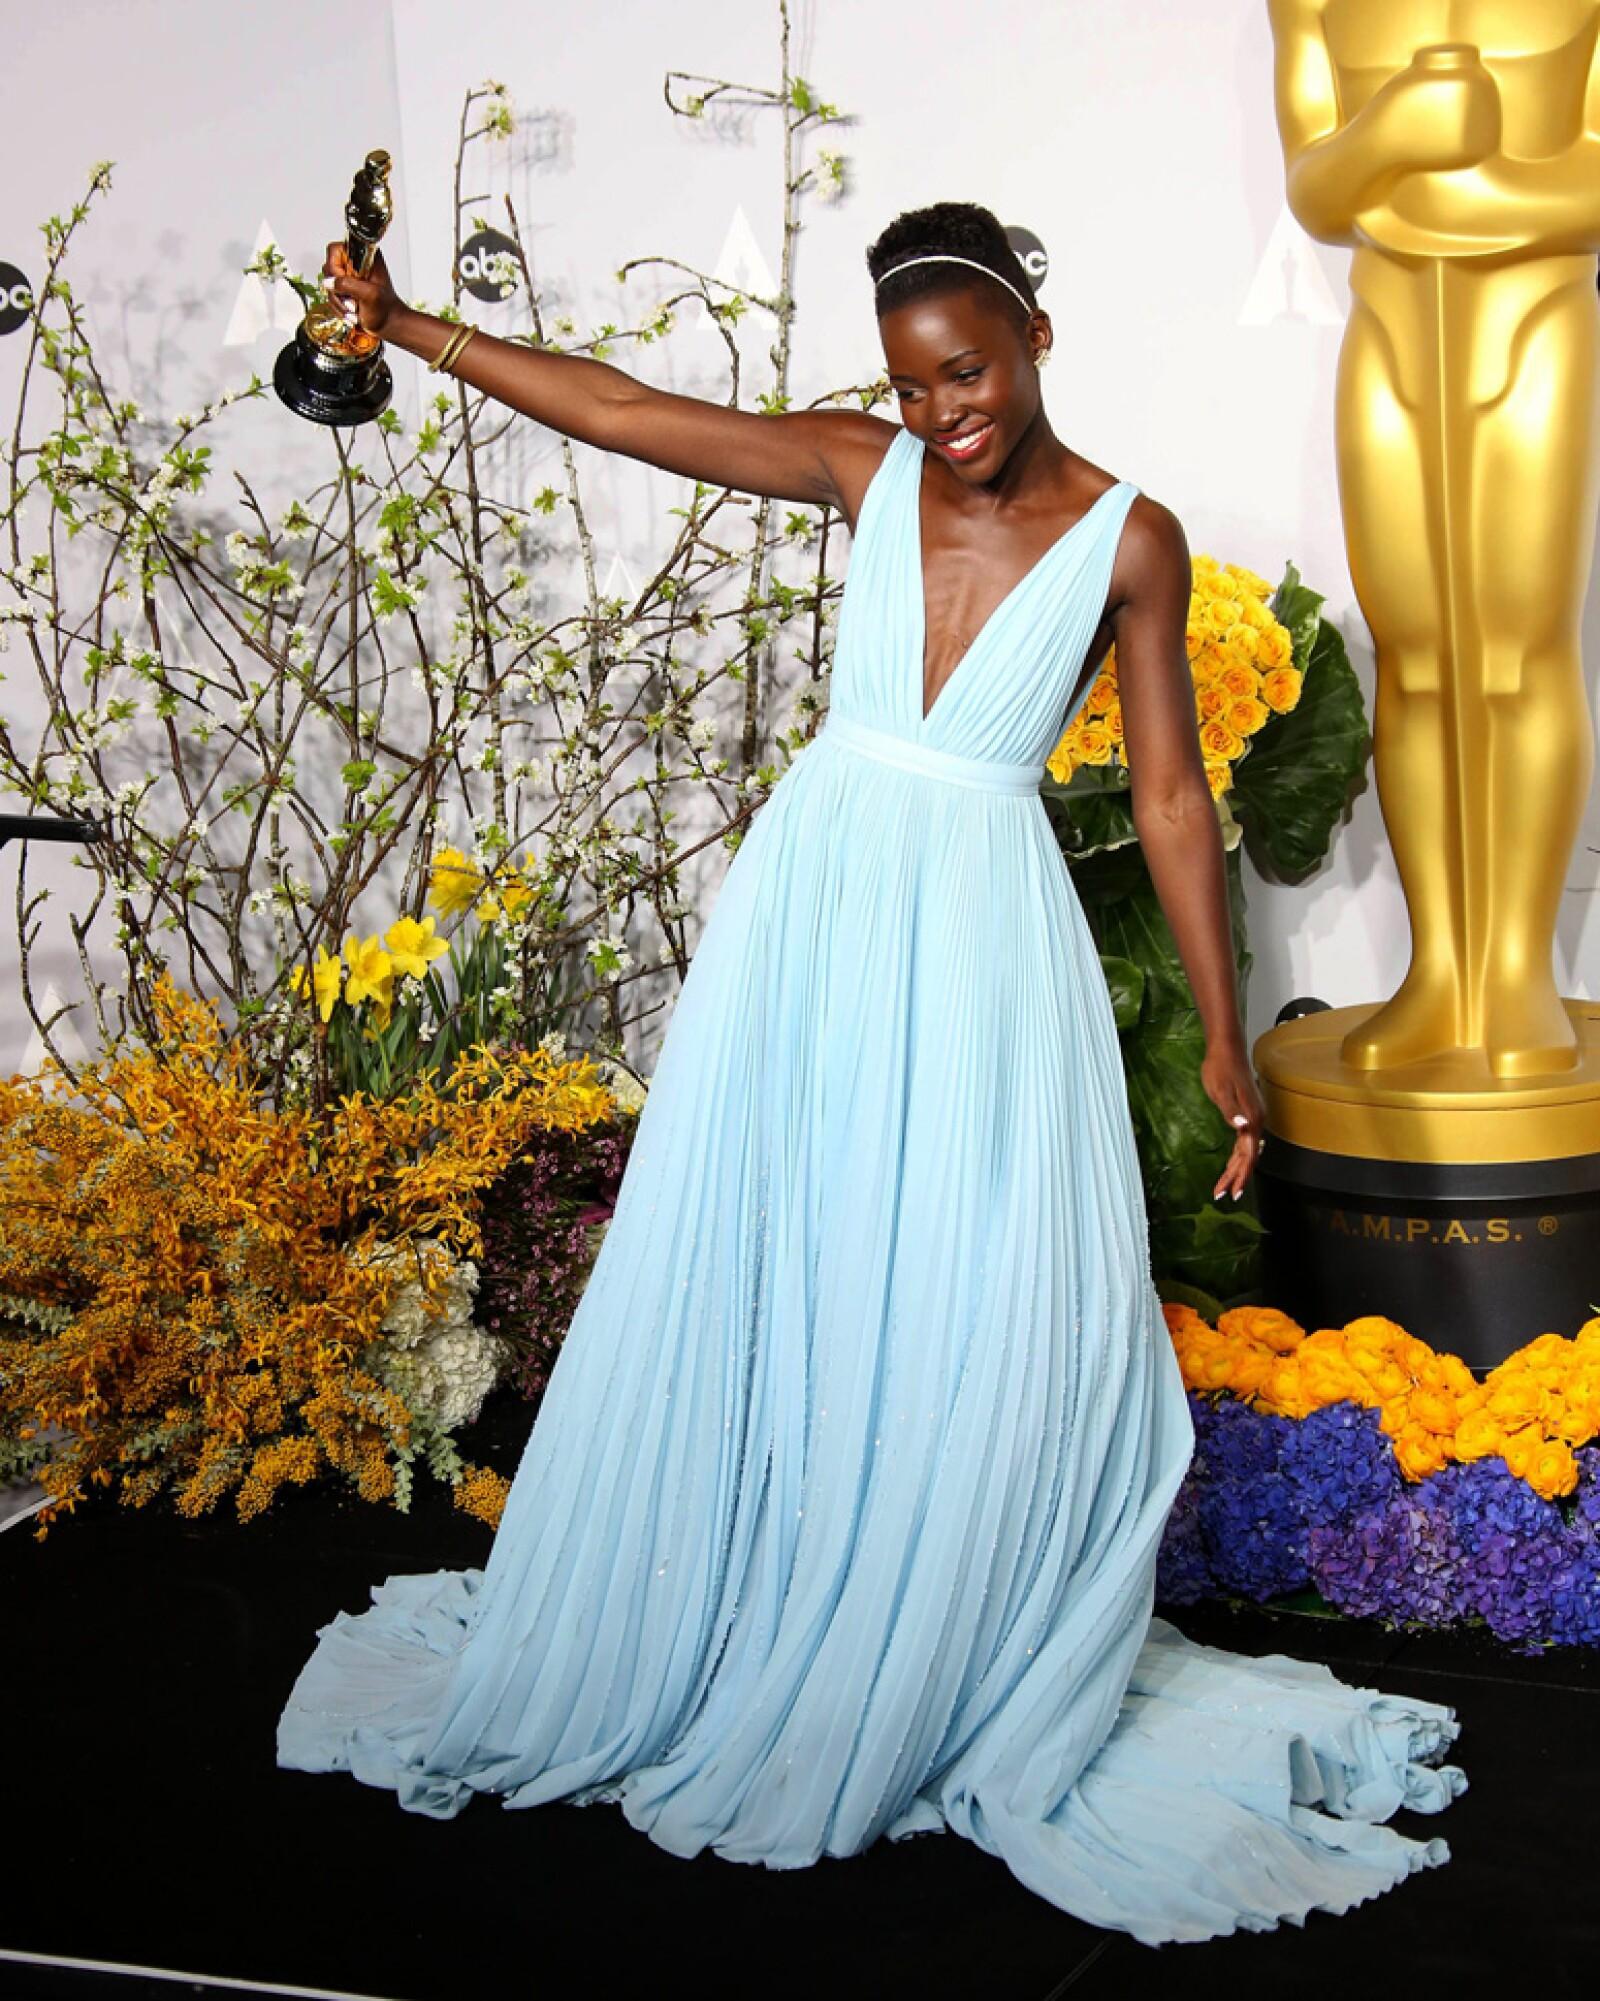 86th Annual Academy Awards Oscars, Press Room, Los Angeles, America - 02 Mar 2014